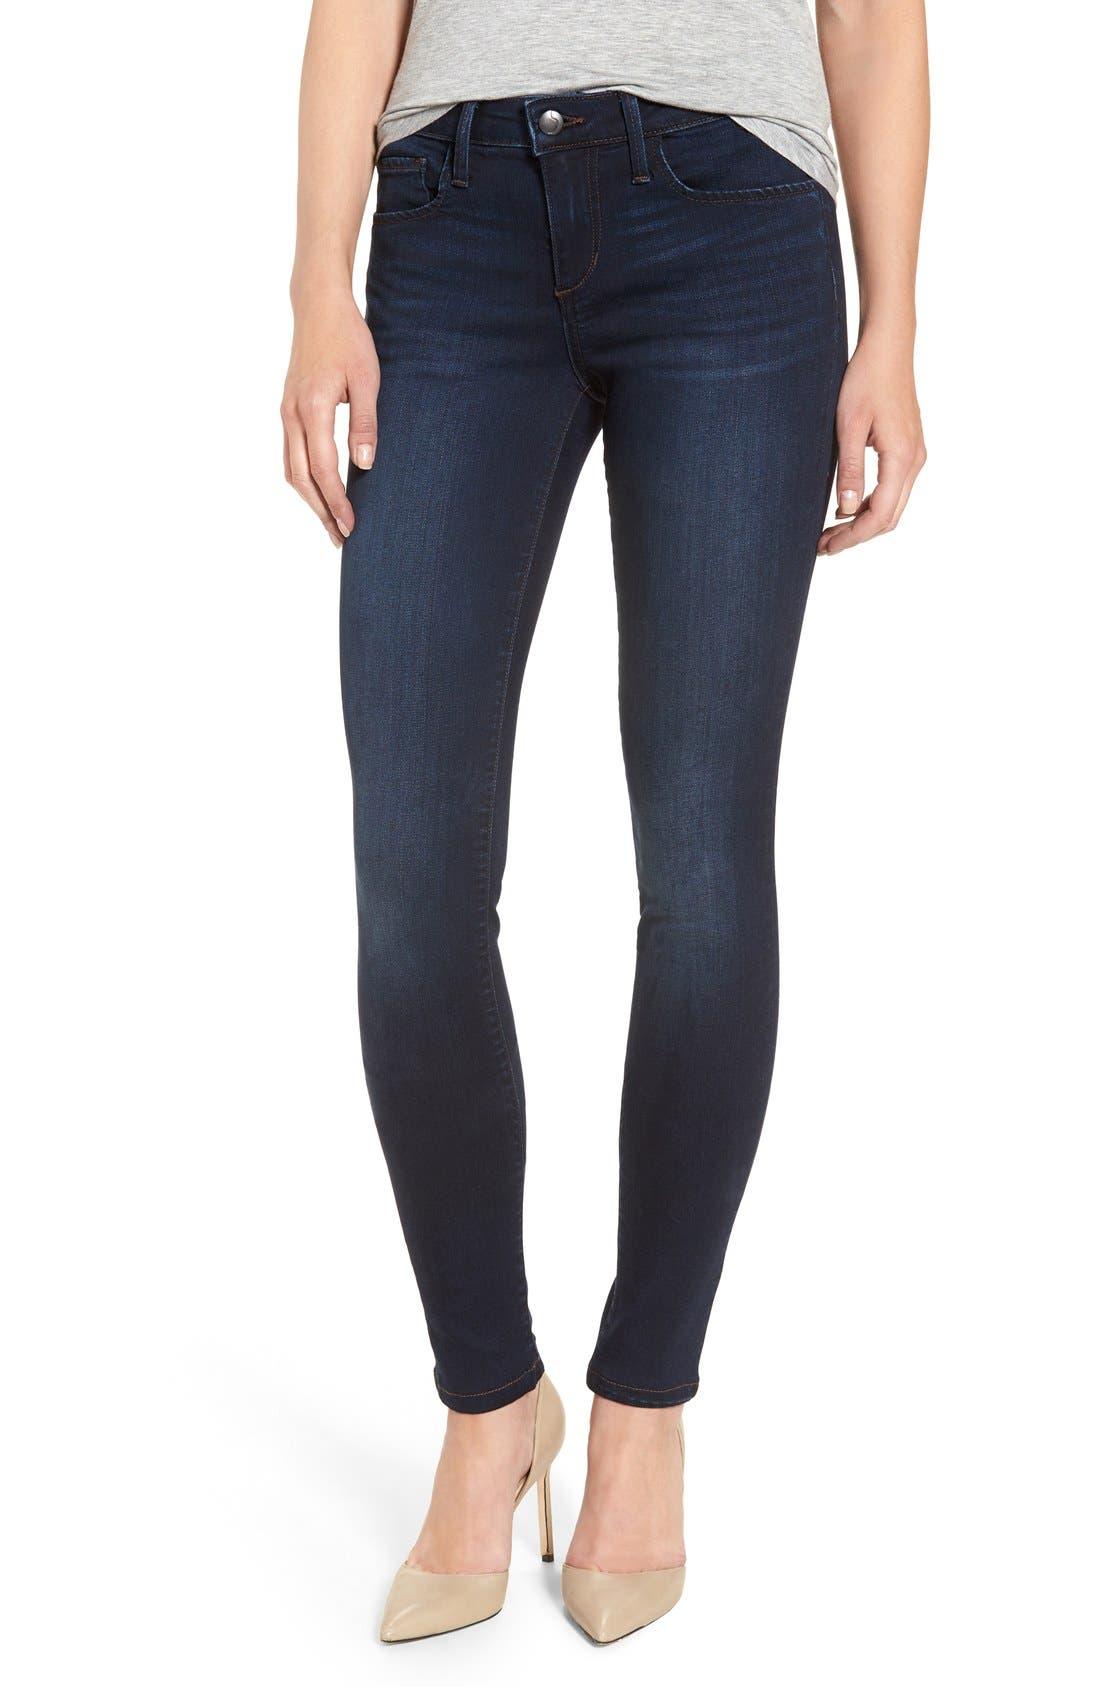 Main Image - Joe's 'Flawless - Twiggy' Skinny Jeans (Selma) (Long)